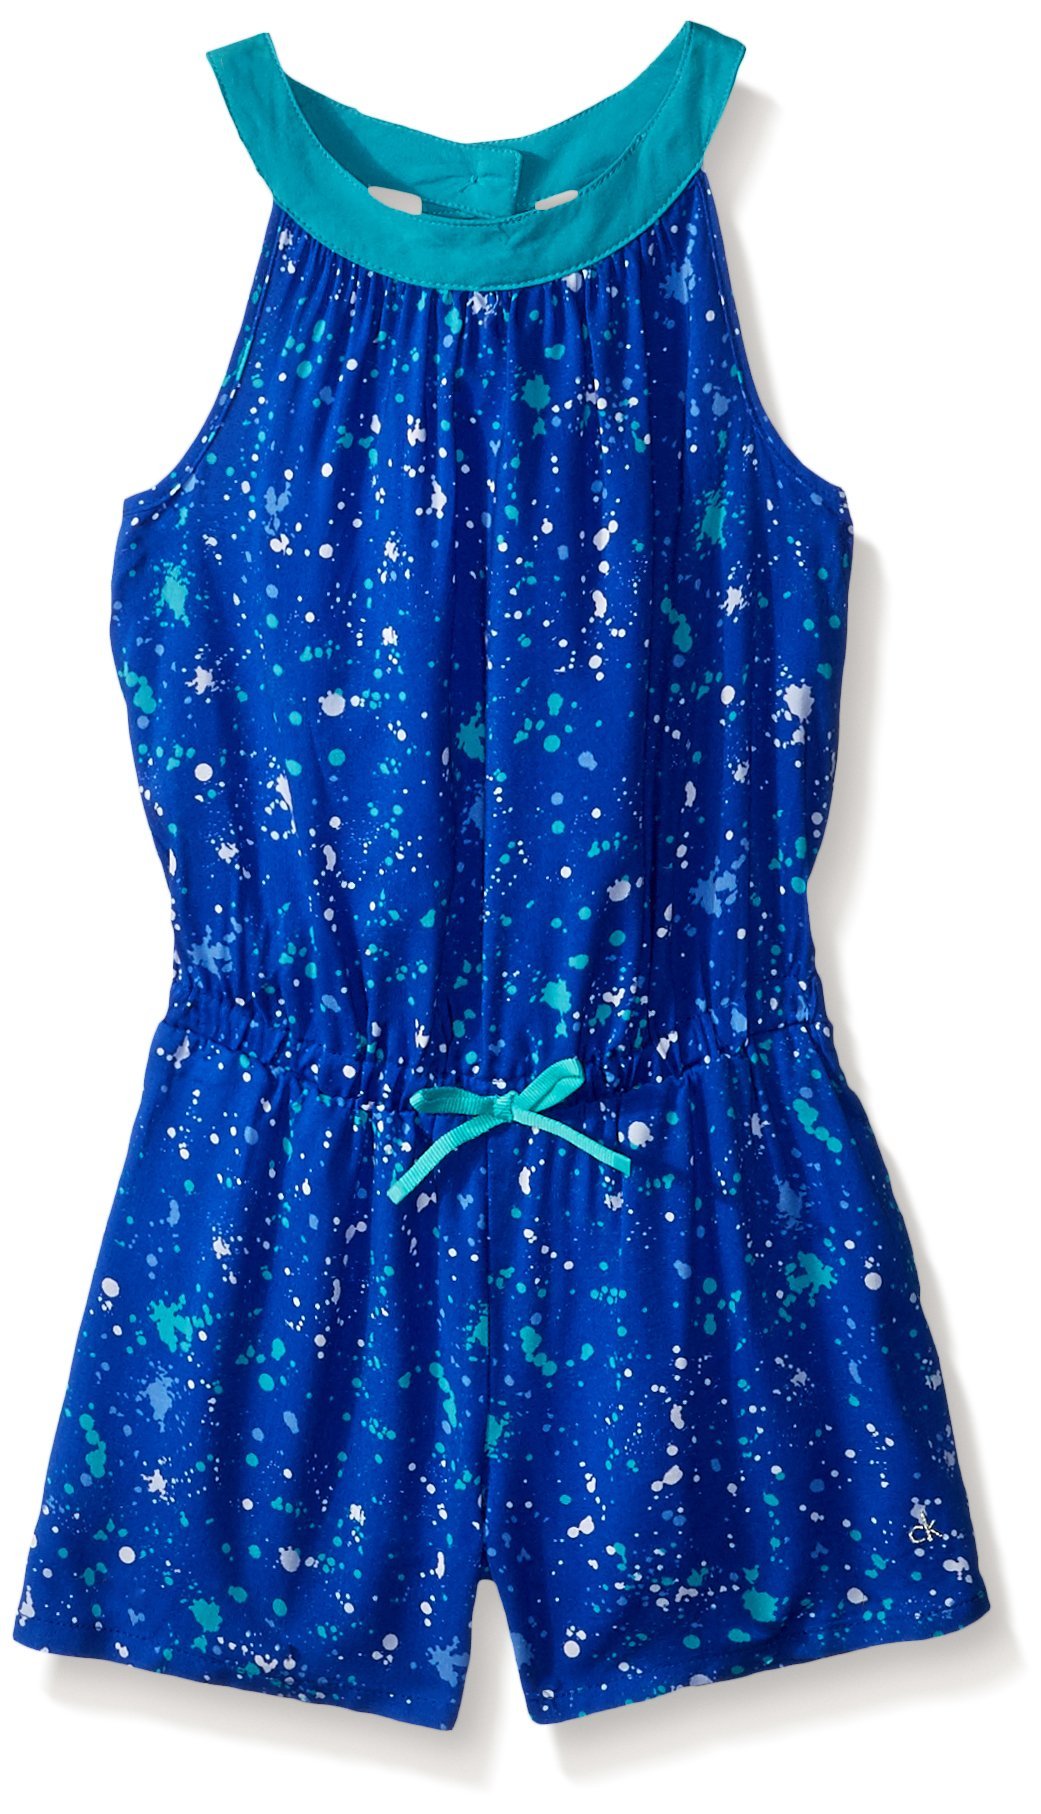 Calvin Klein Big Girls' Romper, Dark Blue Printed, Medium (8/10)